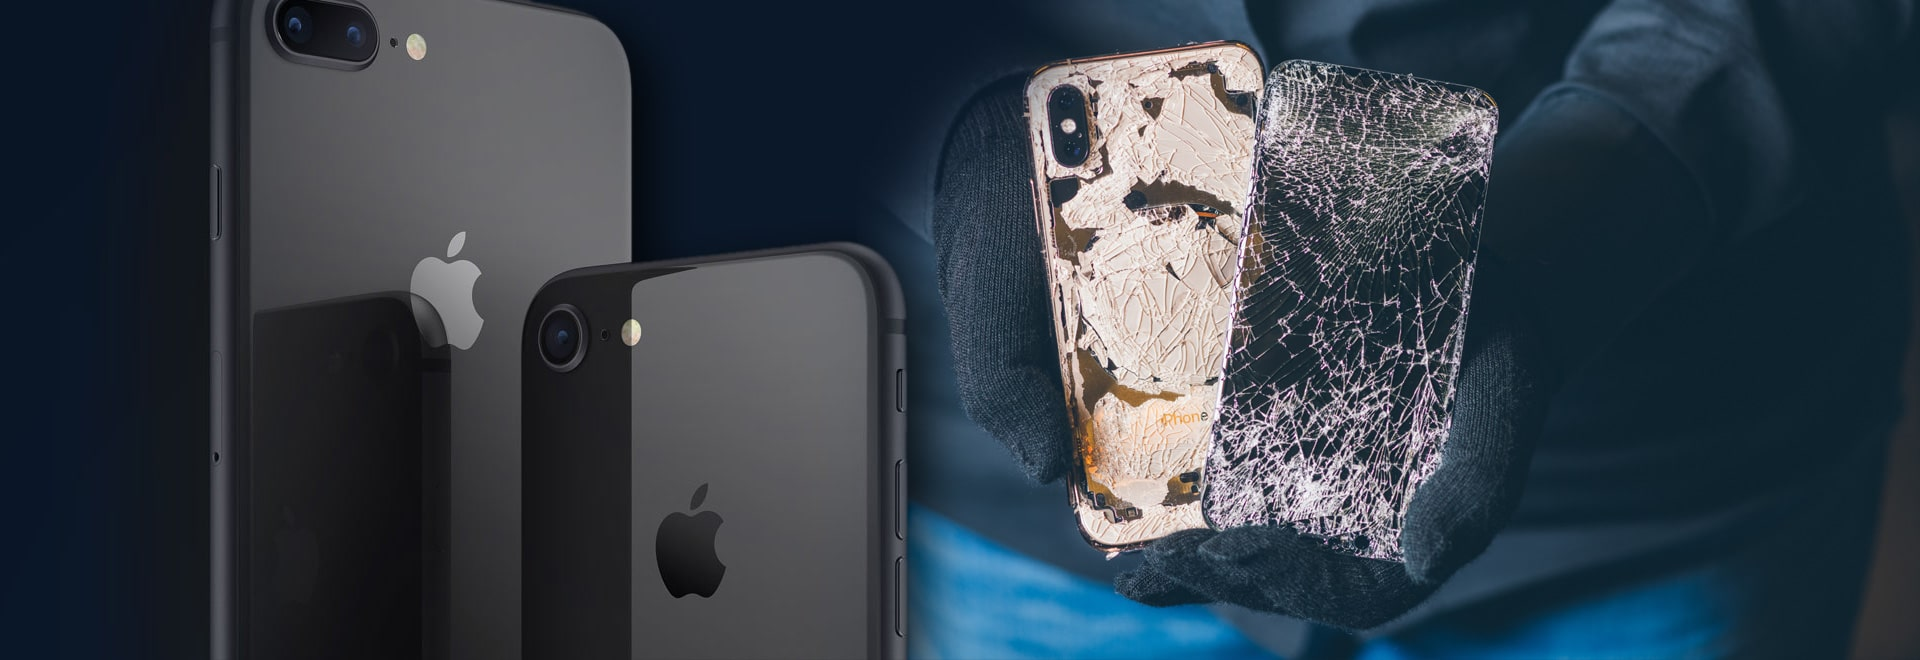 iPhone Data Recovery Service | DriveSavers